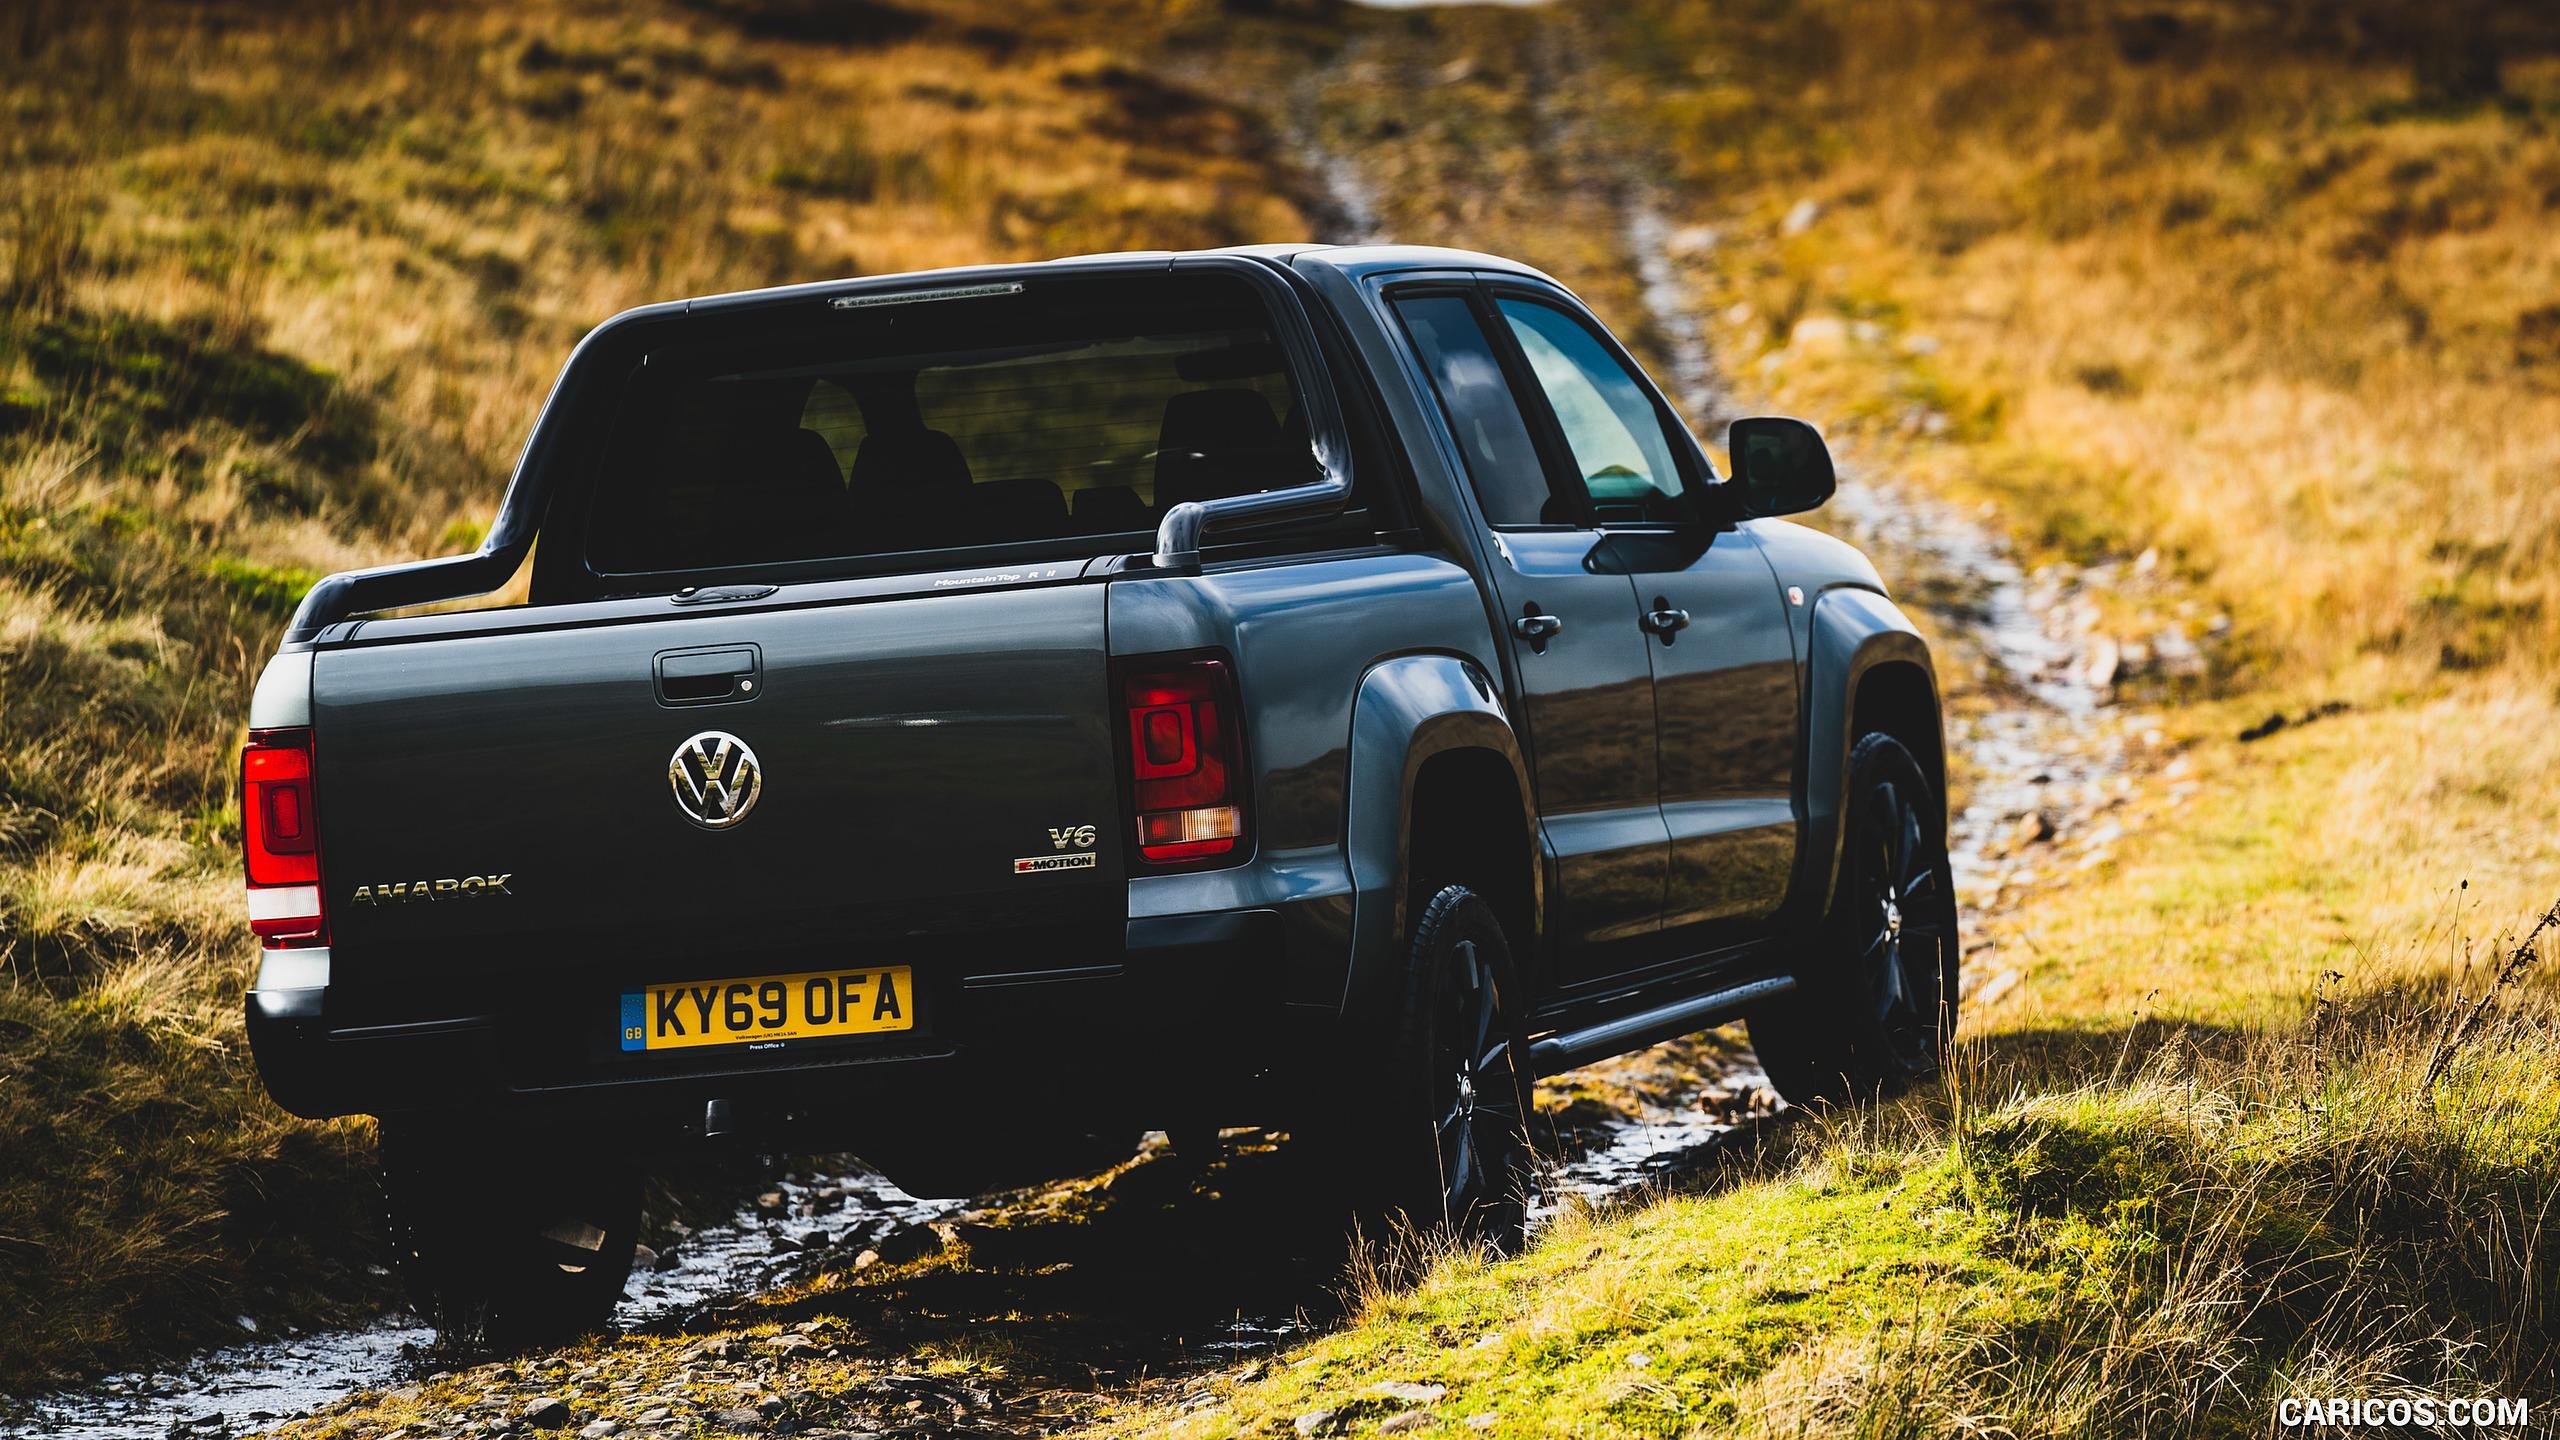 2019 Volkswagen Amarok Black Edition UK Spec   Rear Three 2560x1440